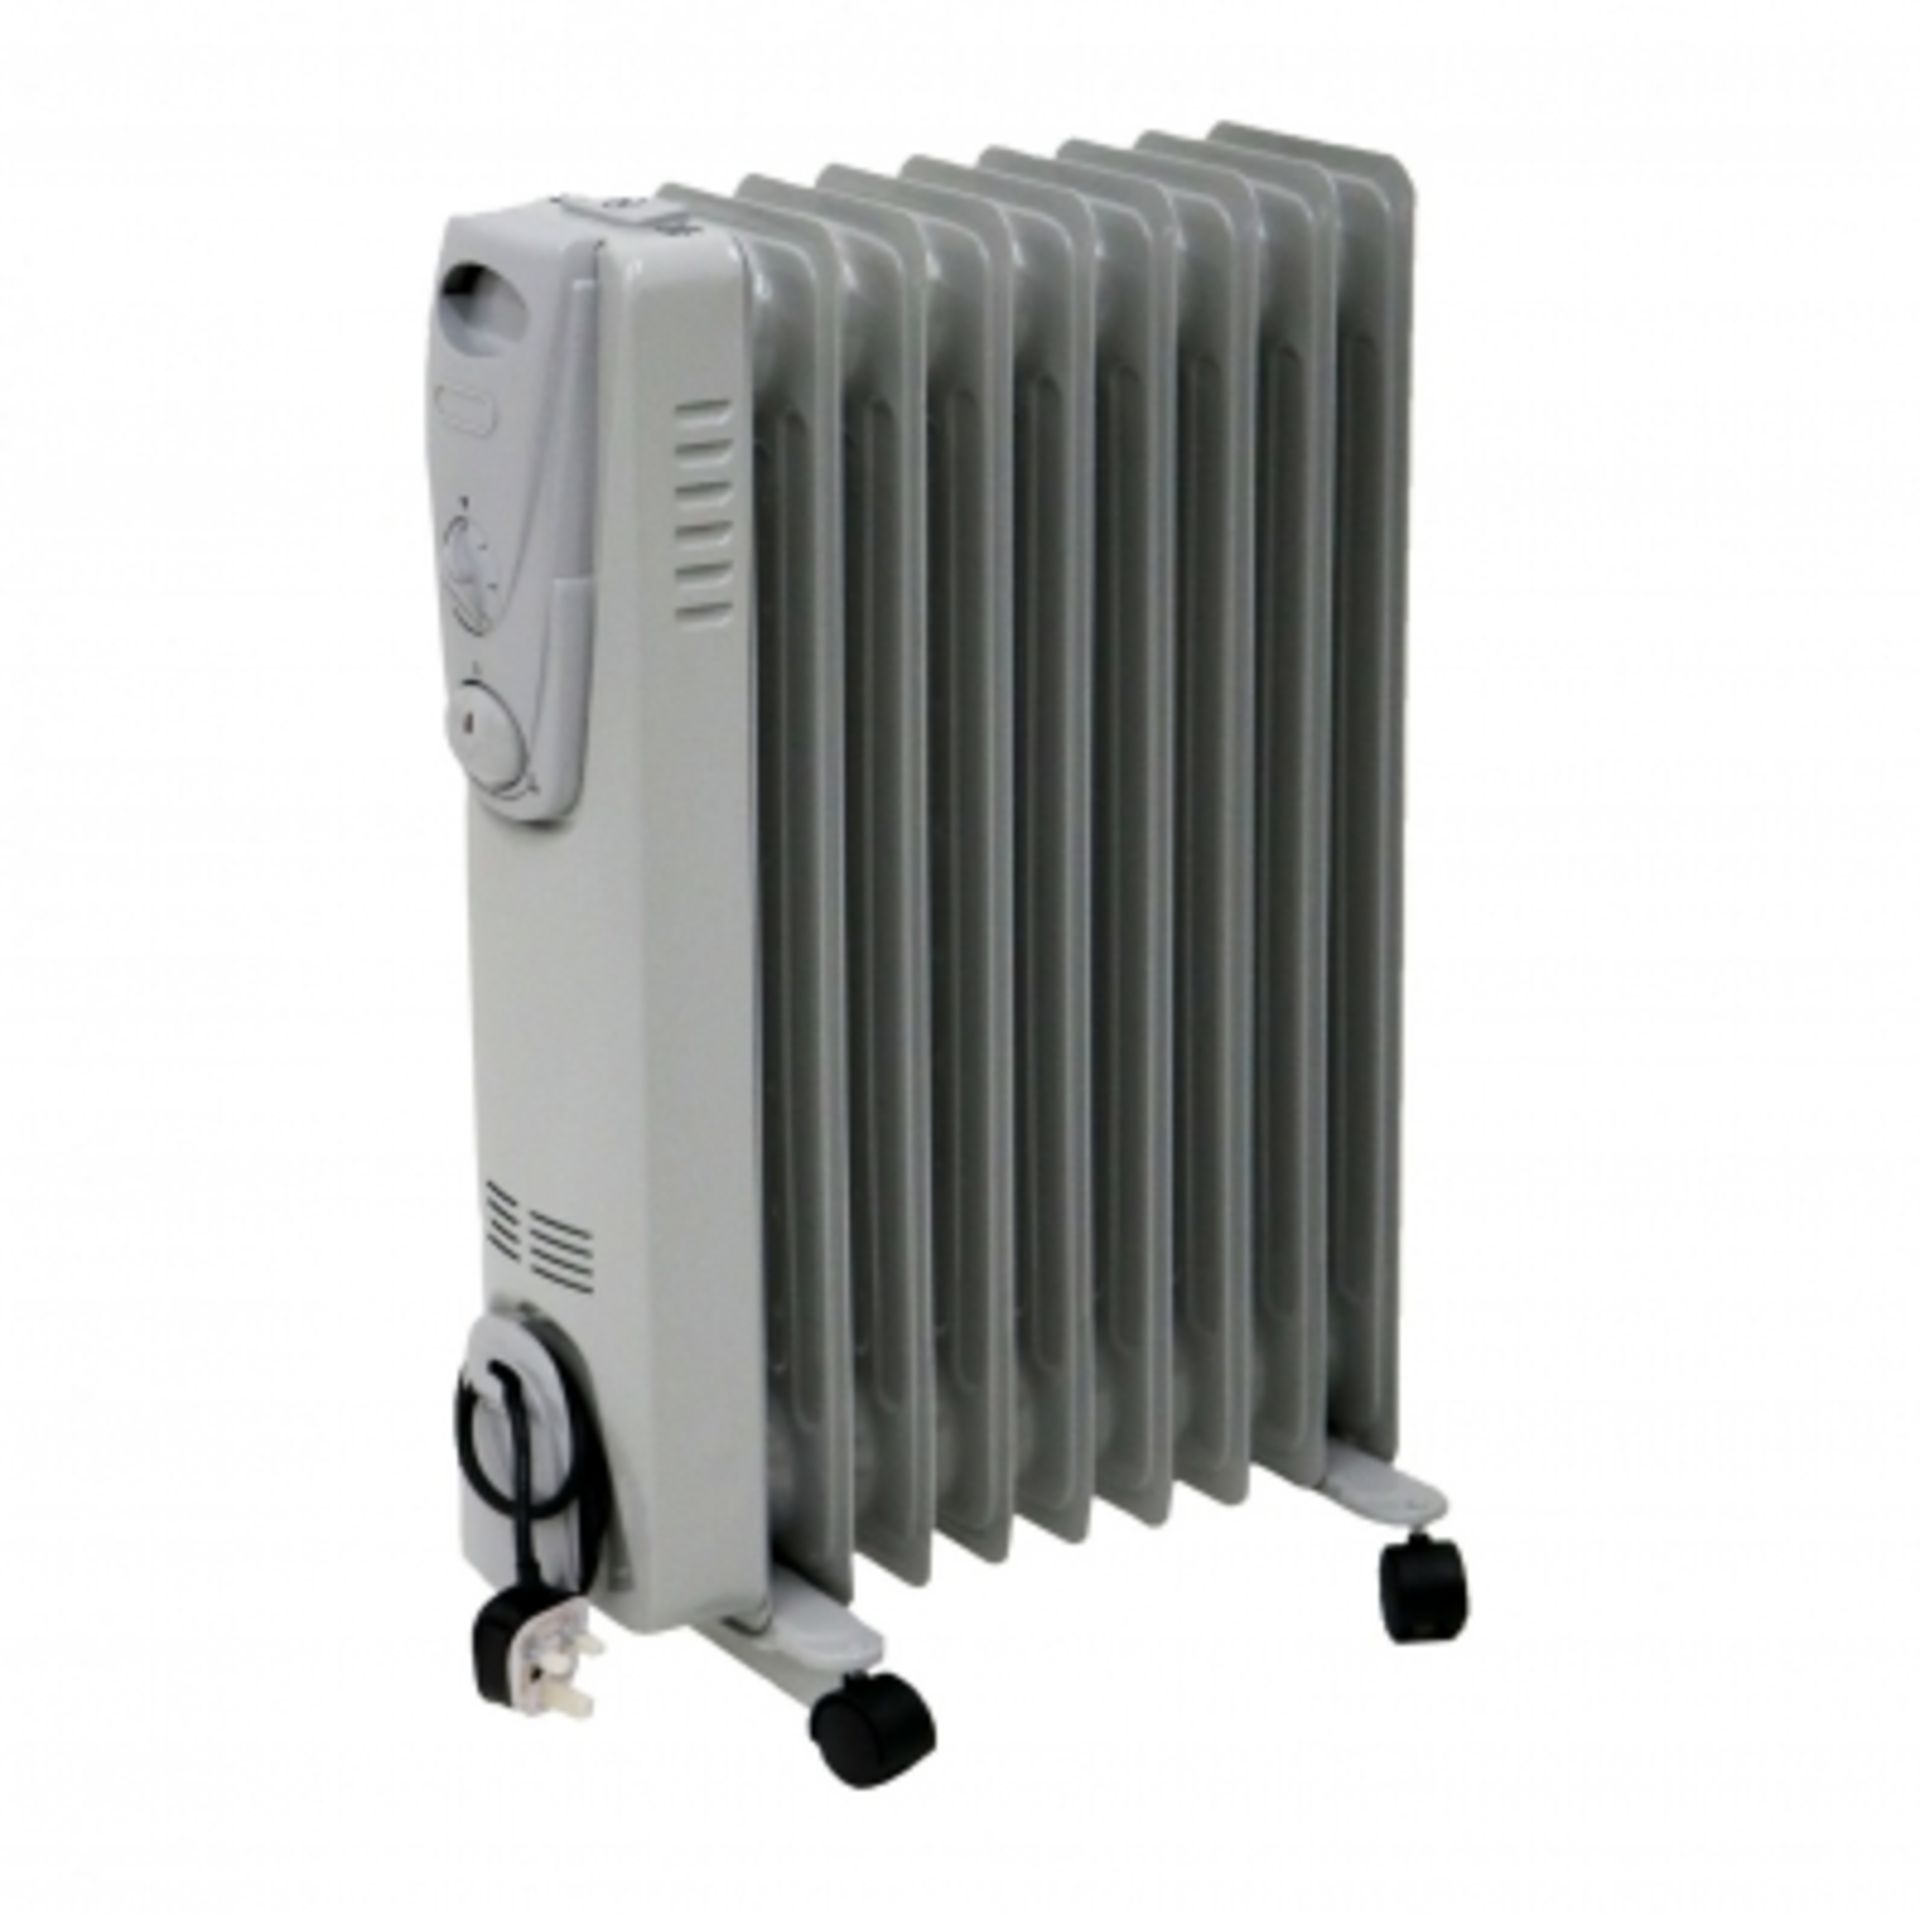 Lot 13 - (RU8) 2000W 9 Fin Portable Oil Filled Radiator Electric Heater The 2000W Oil Filled Radiat...